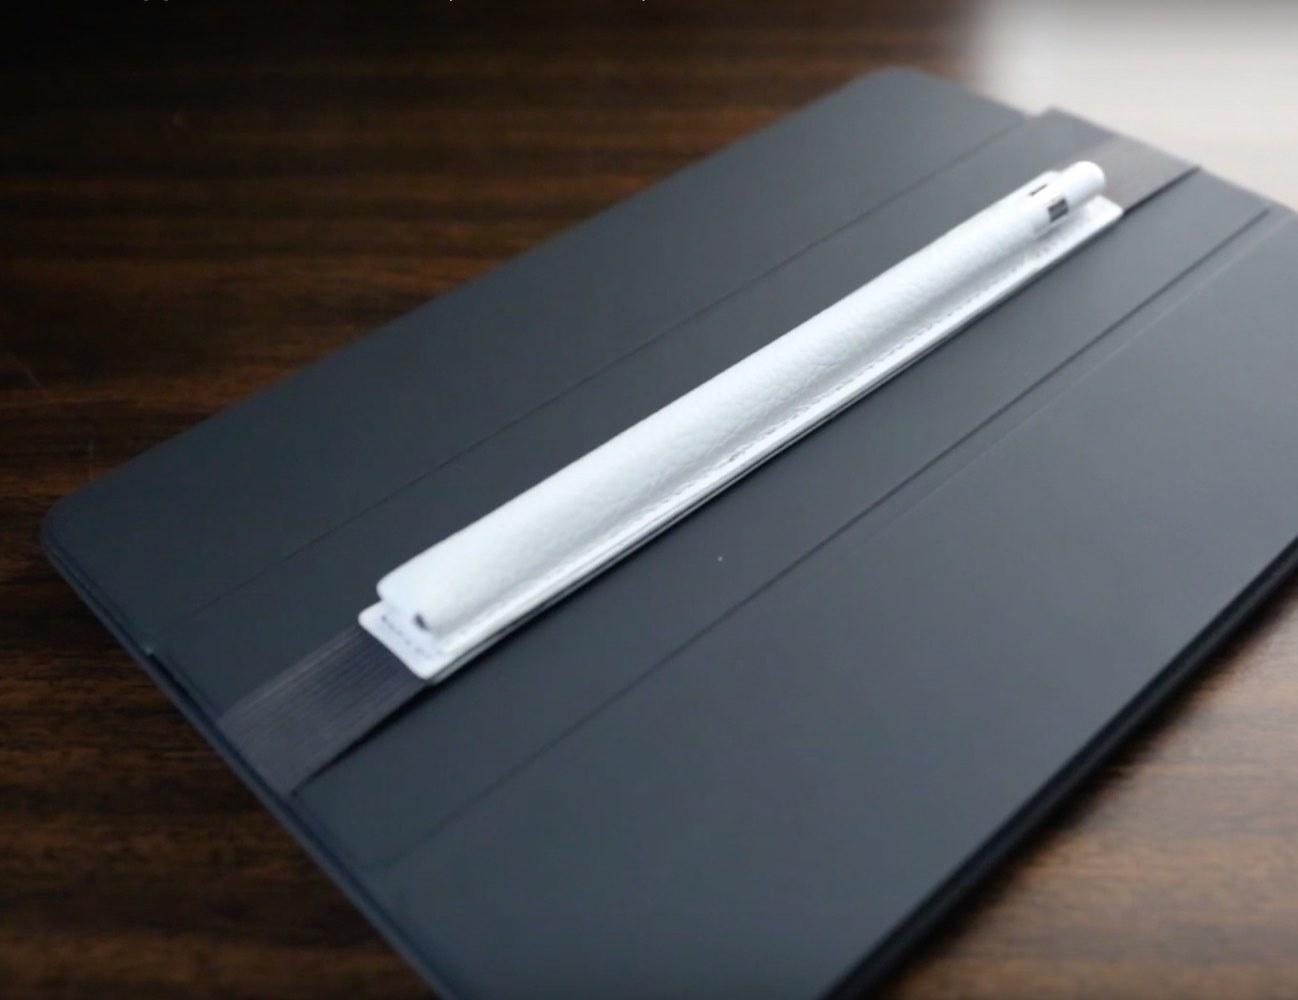 StilGut Leather Sleeve for Apple Pencil